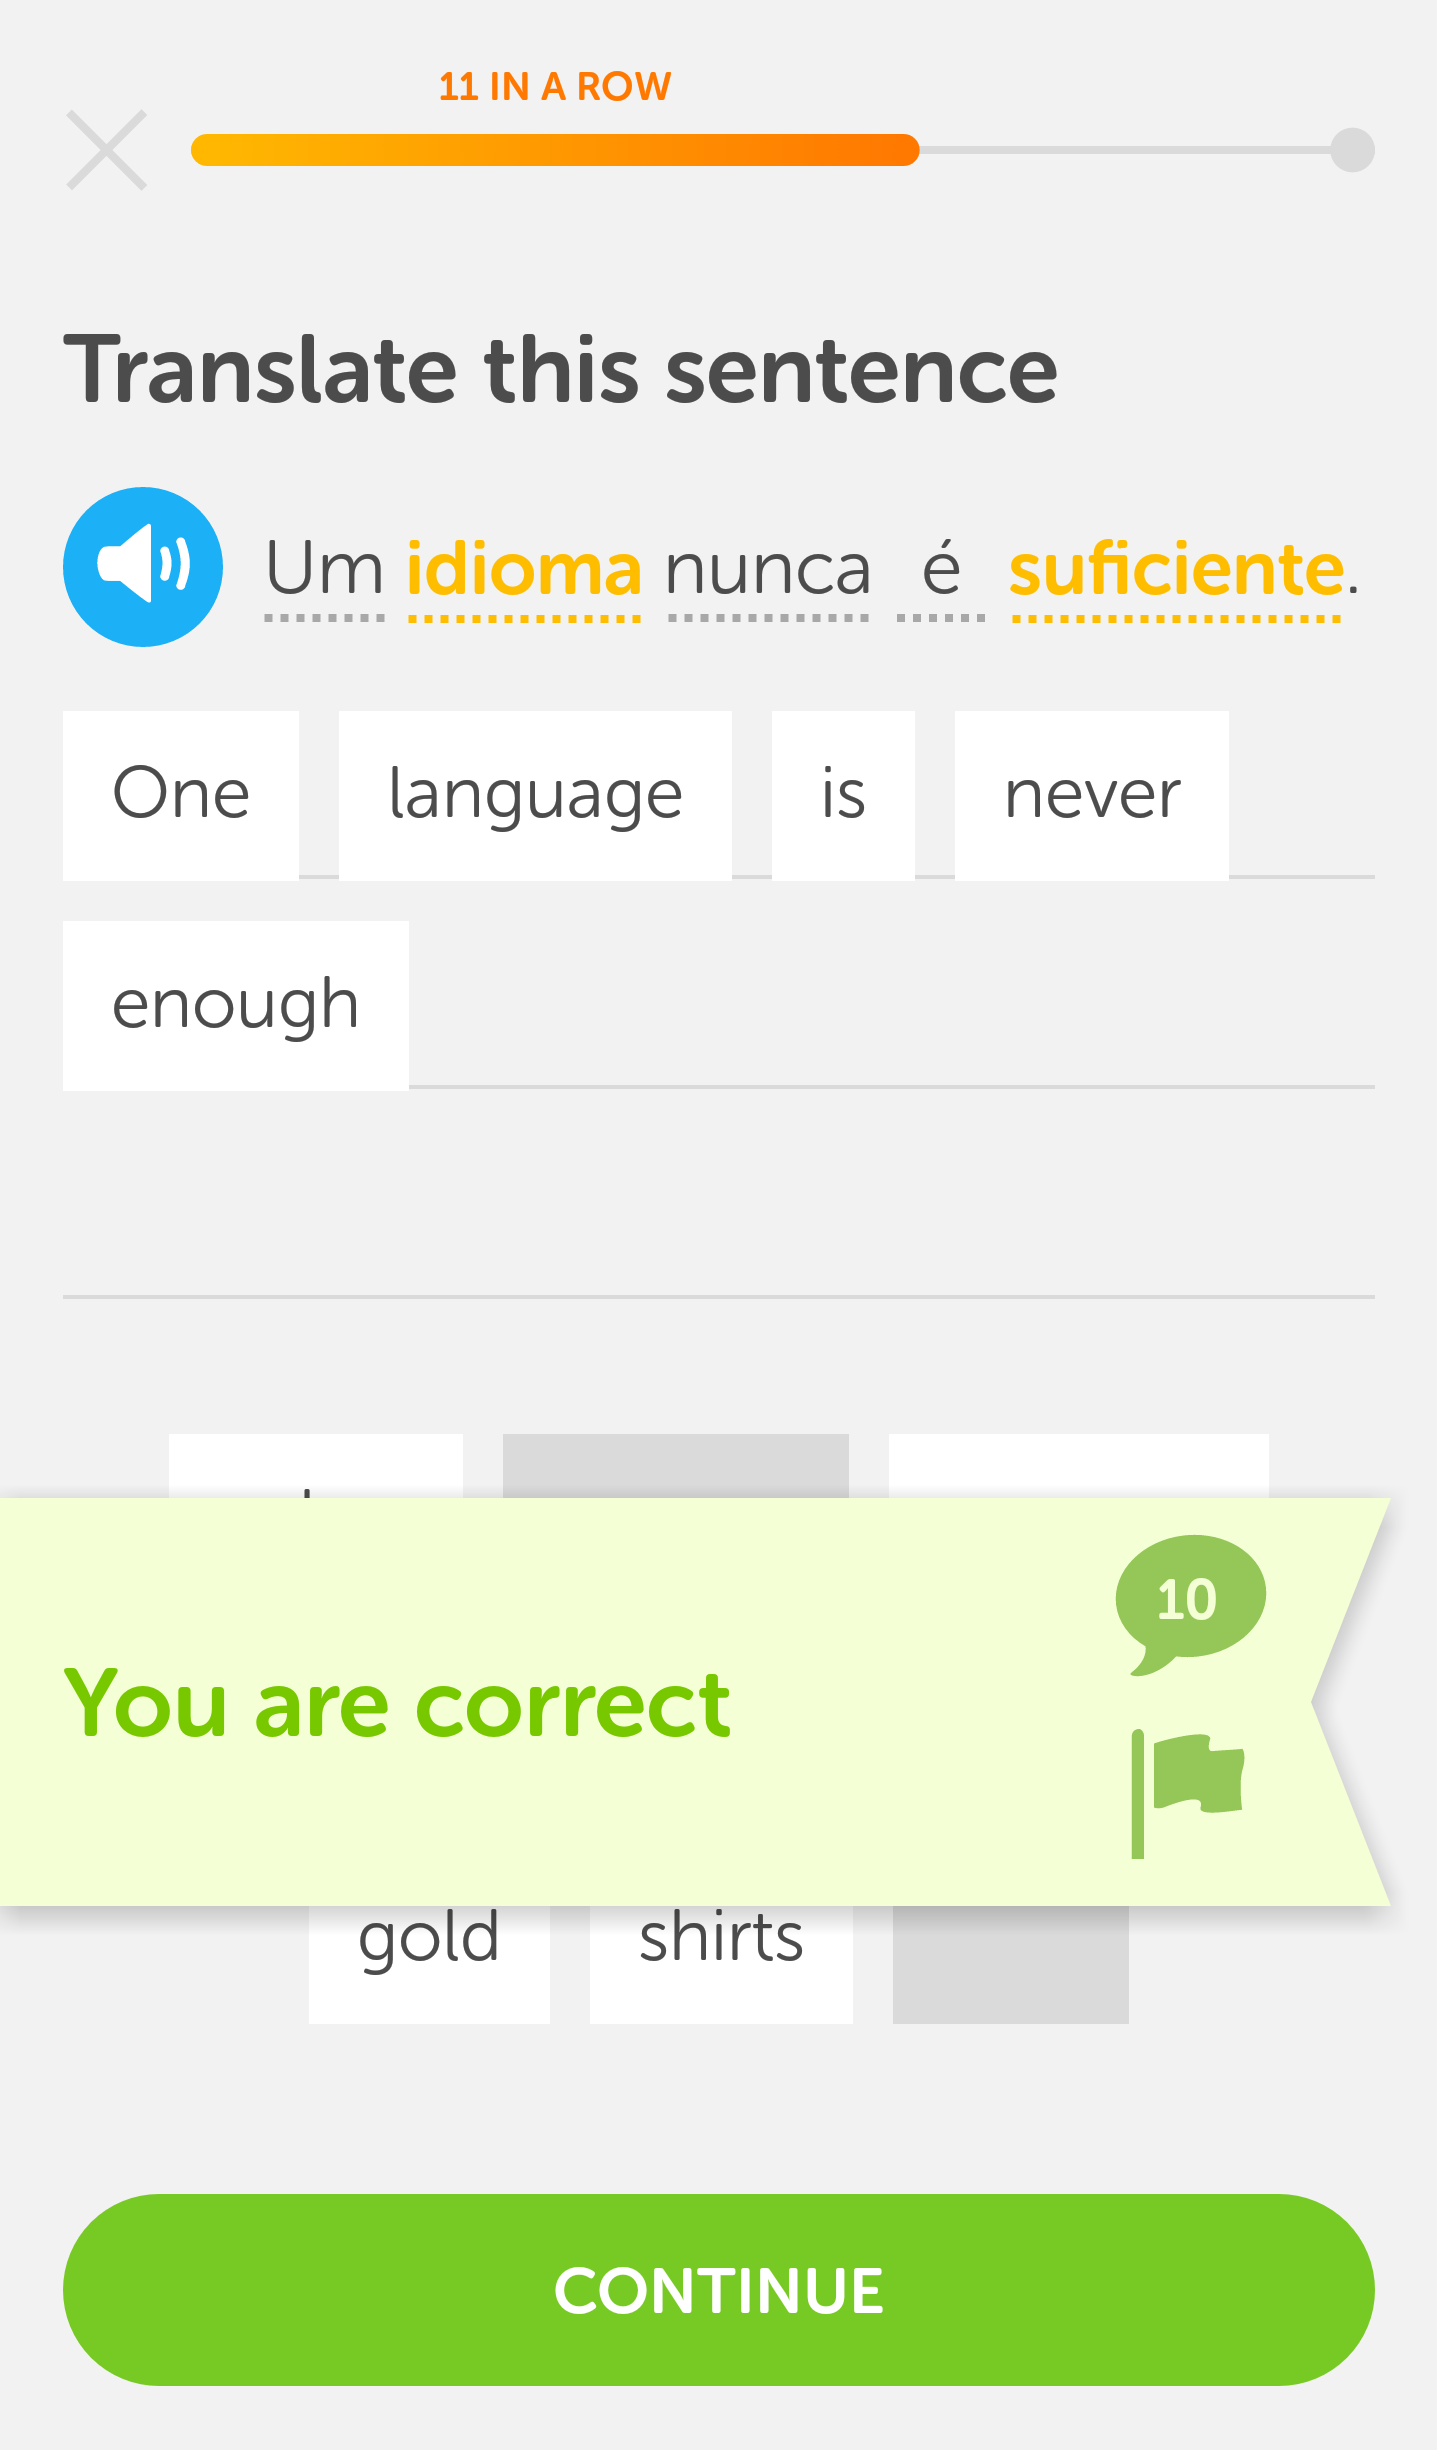 Duolingo image.png